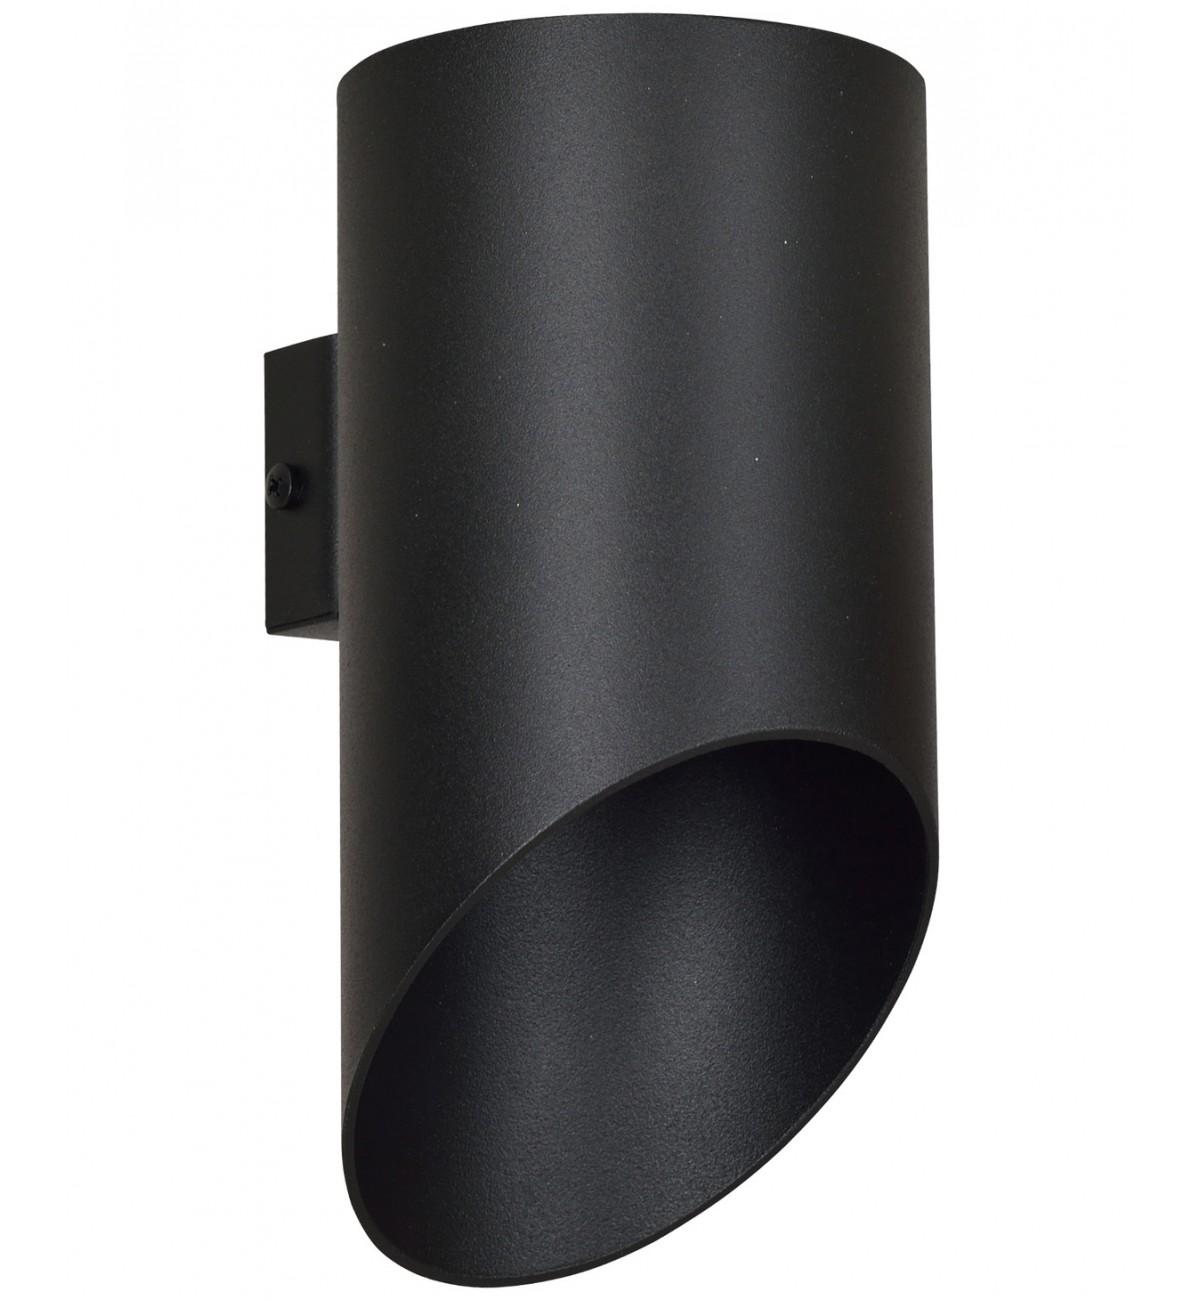 lampa kinkiet metalowa stylowa